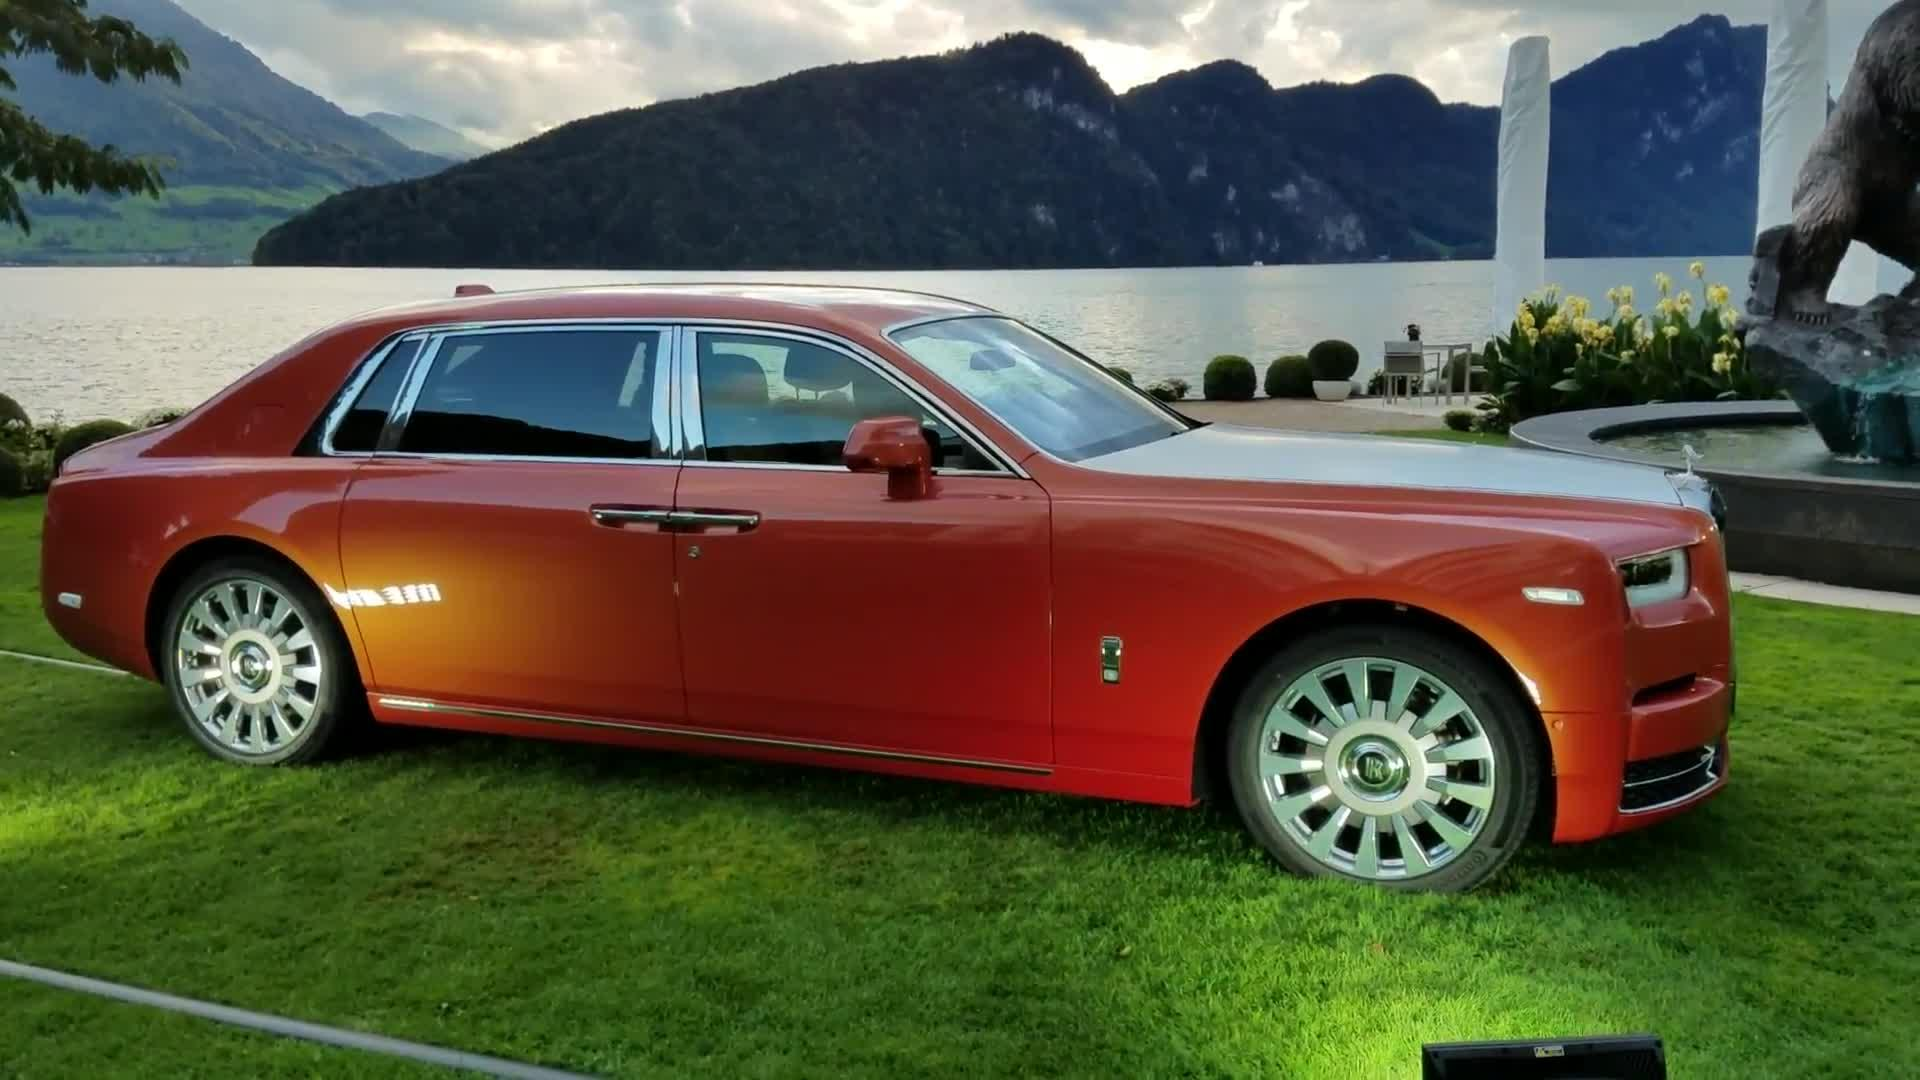 4x4 Bmw X7 >> The Phantom-based Rolls-Royce Cullinan crossover SUV is coming soon. - Autoblog